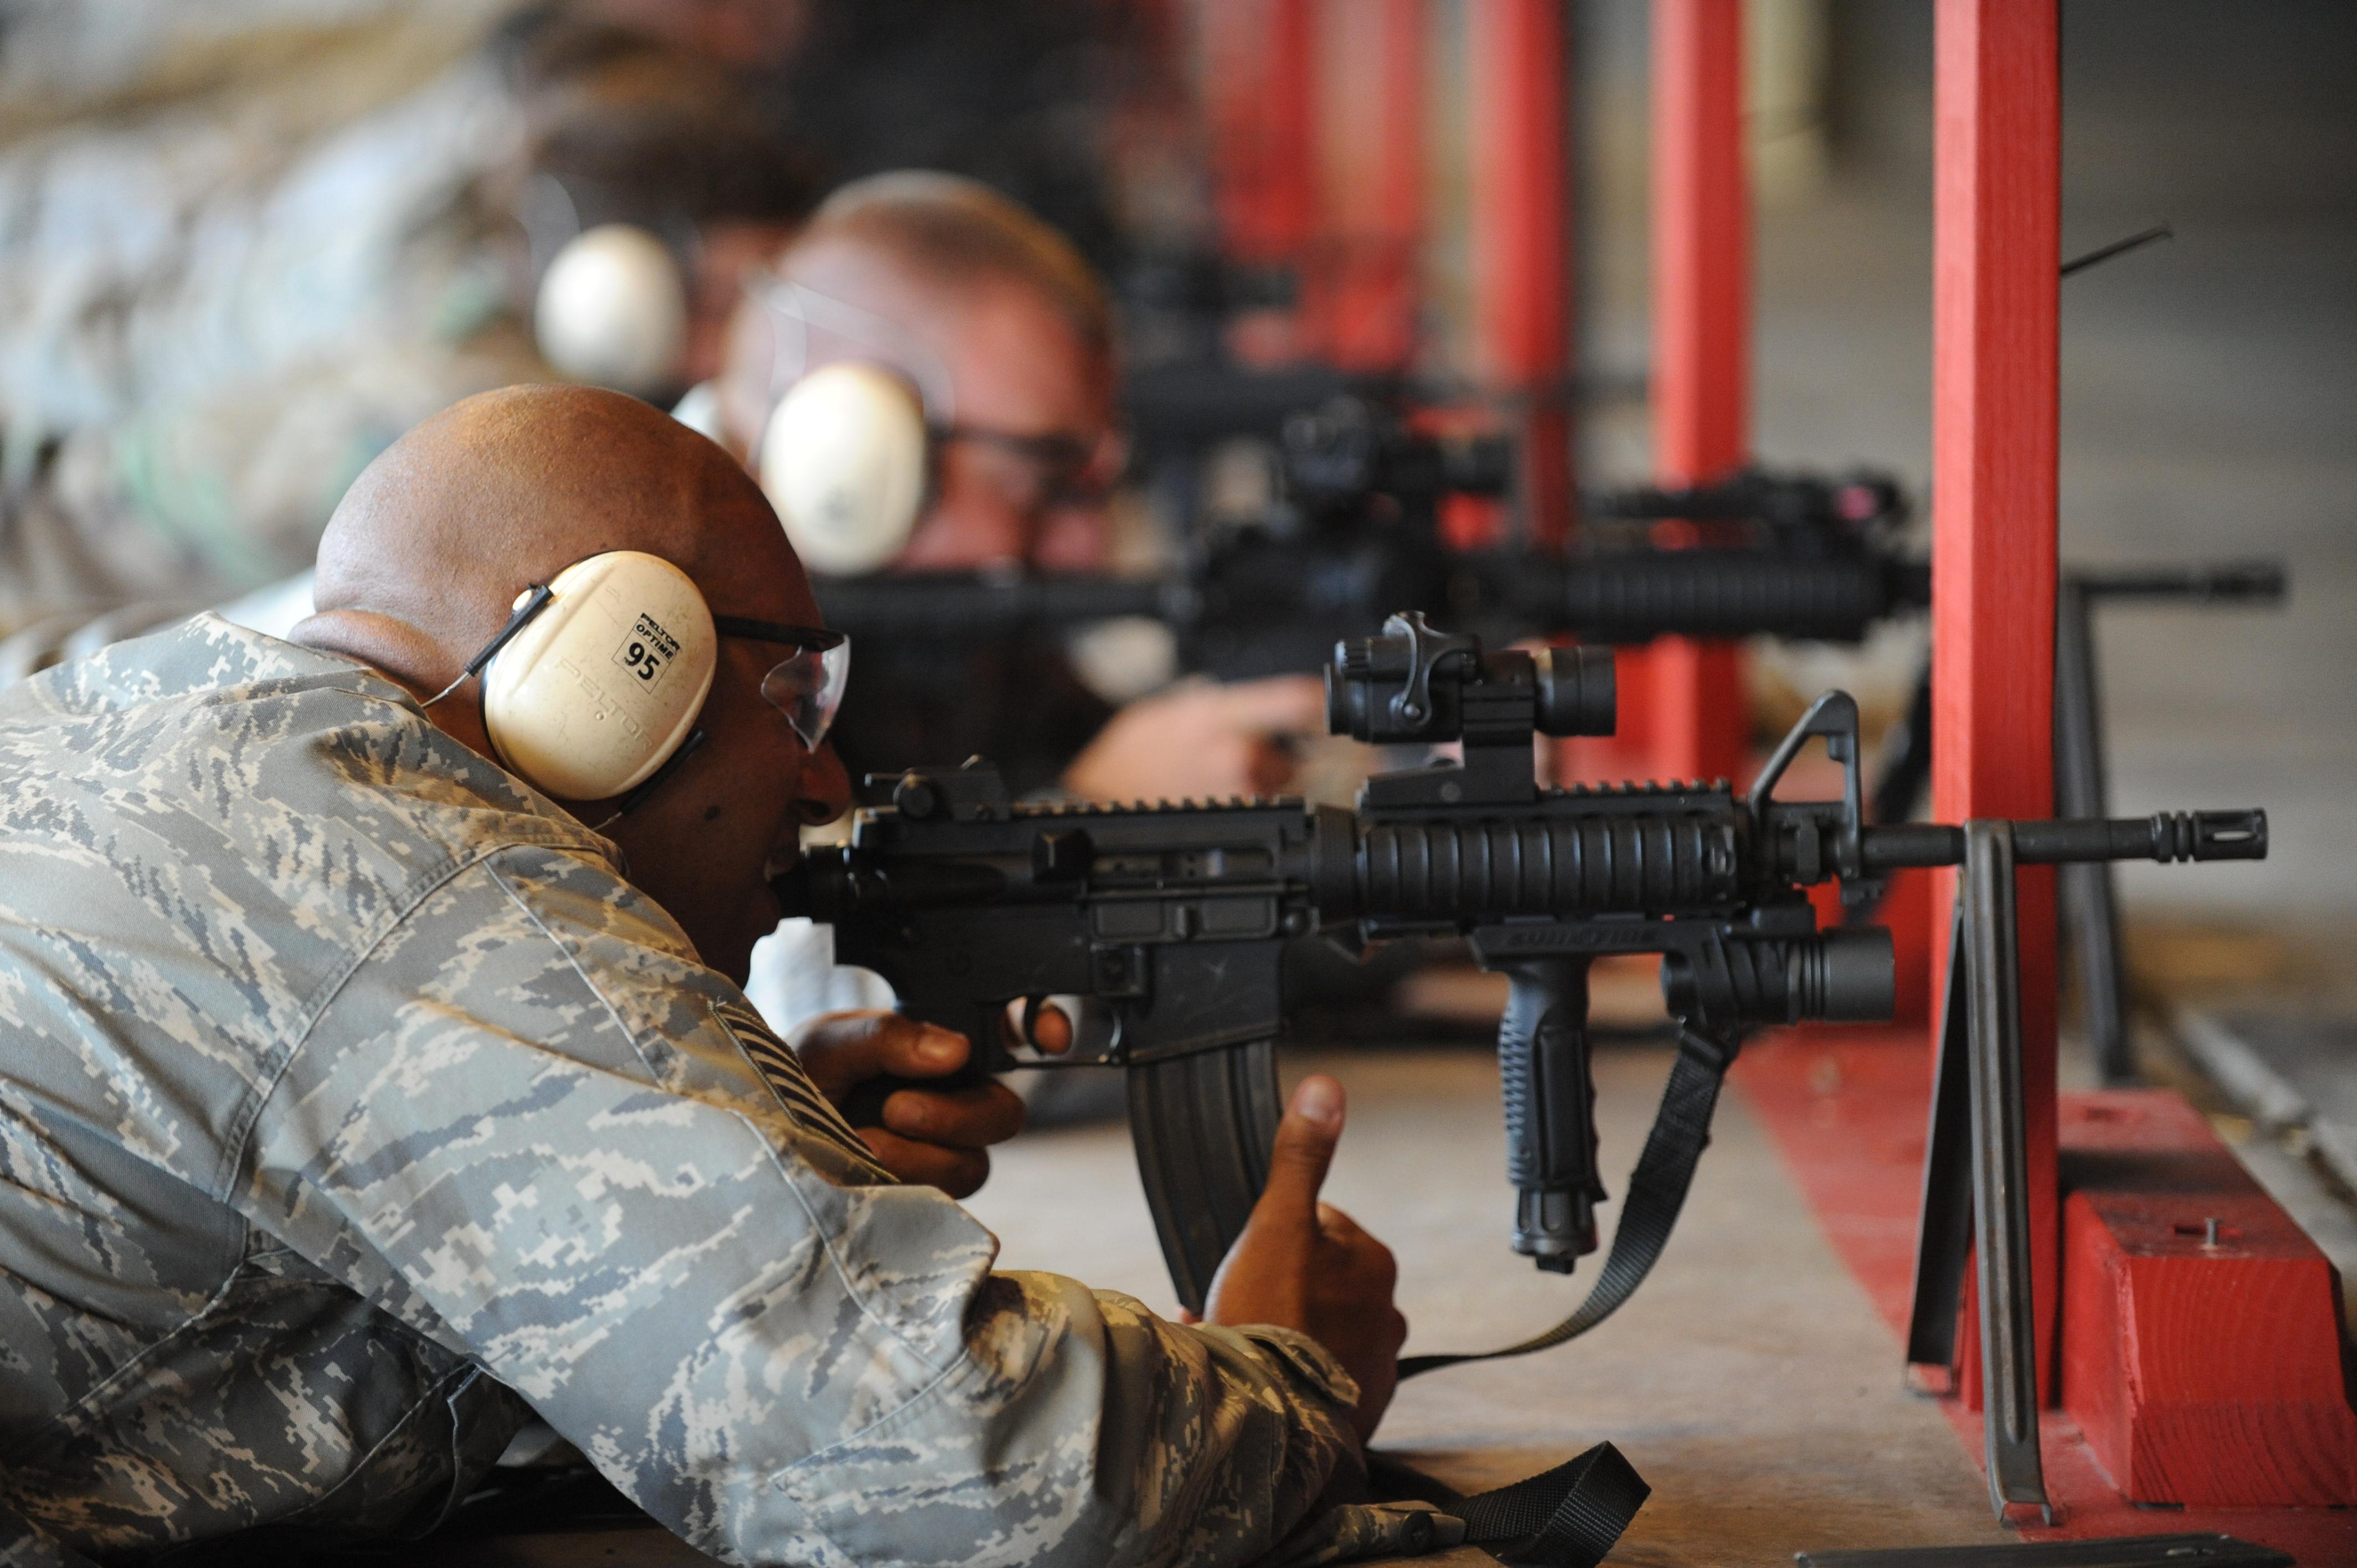 catm range passes evaluation resumes weapons training  catm range passes evaluation resumes weapons training 22